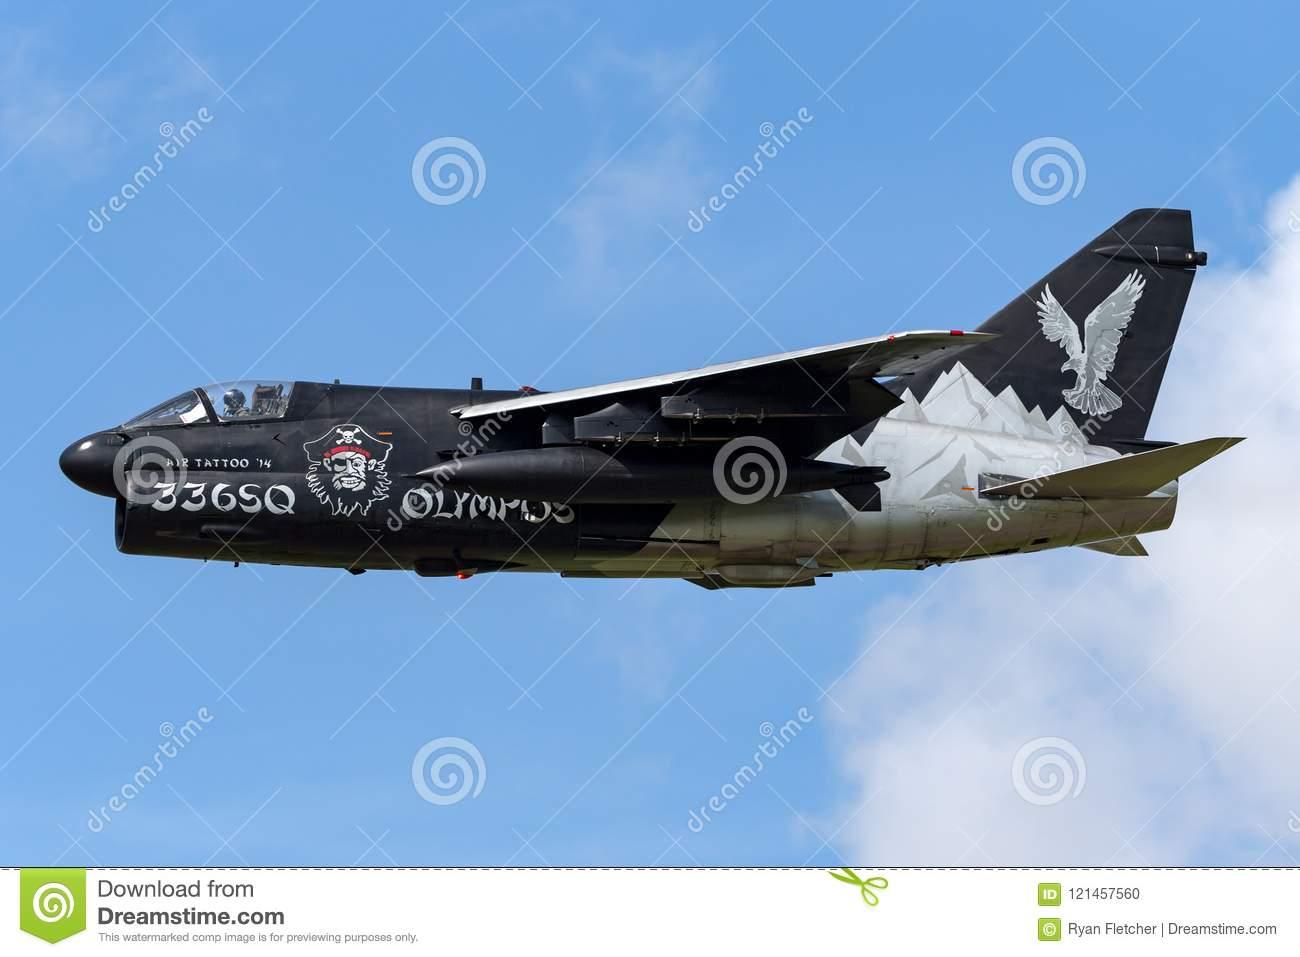 Greek Air Force Hellenic Air Force LTV A.